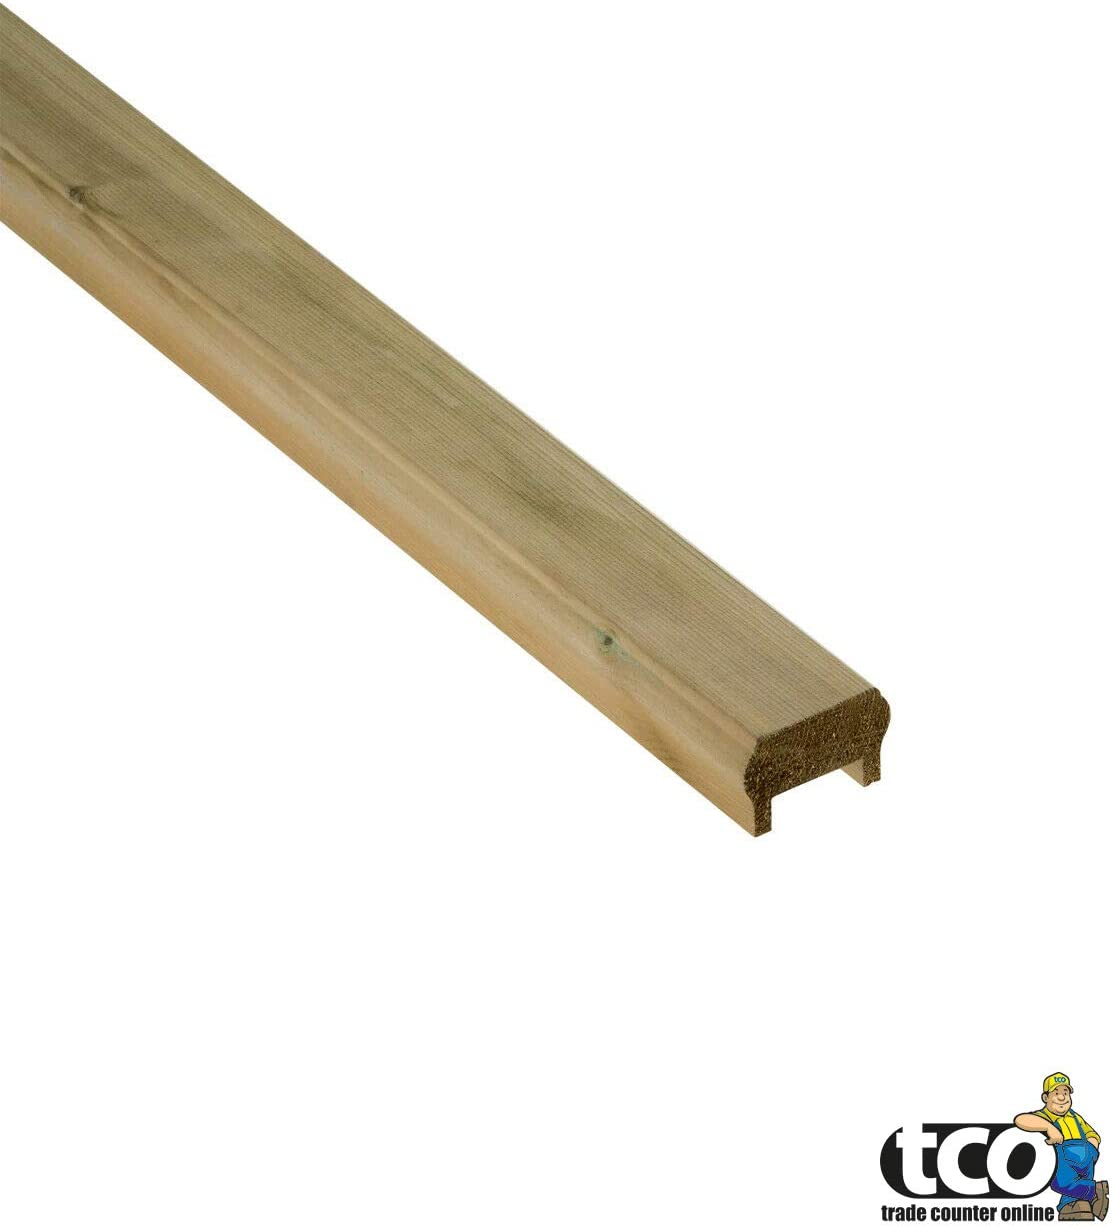 Base Rail 1800mm 1.8m Decking Panel Wooden Decking Handrail